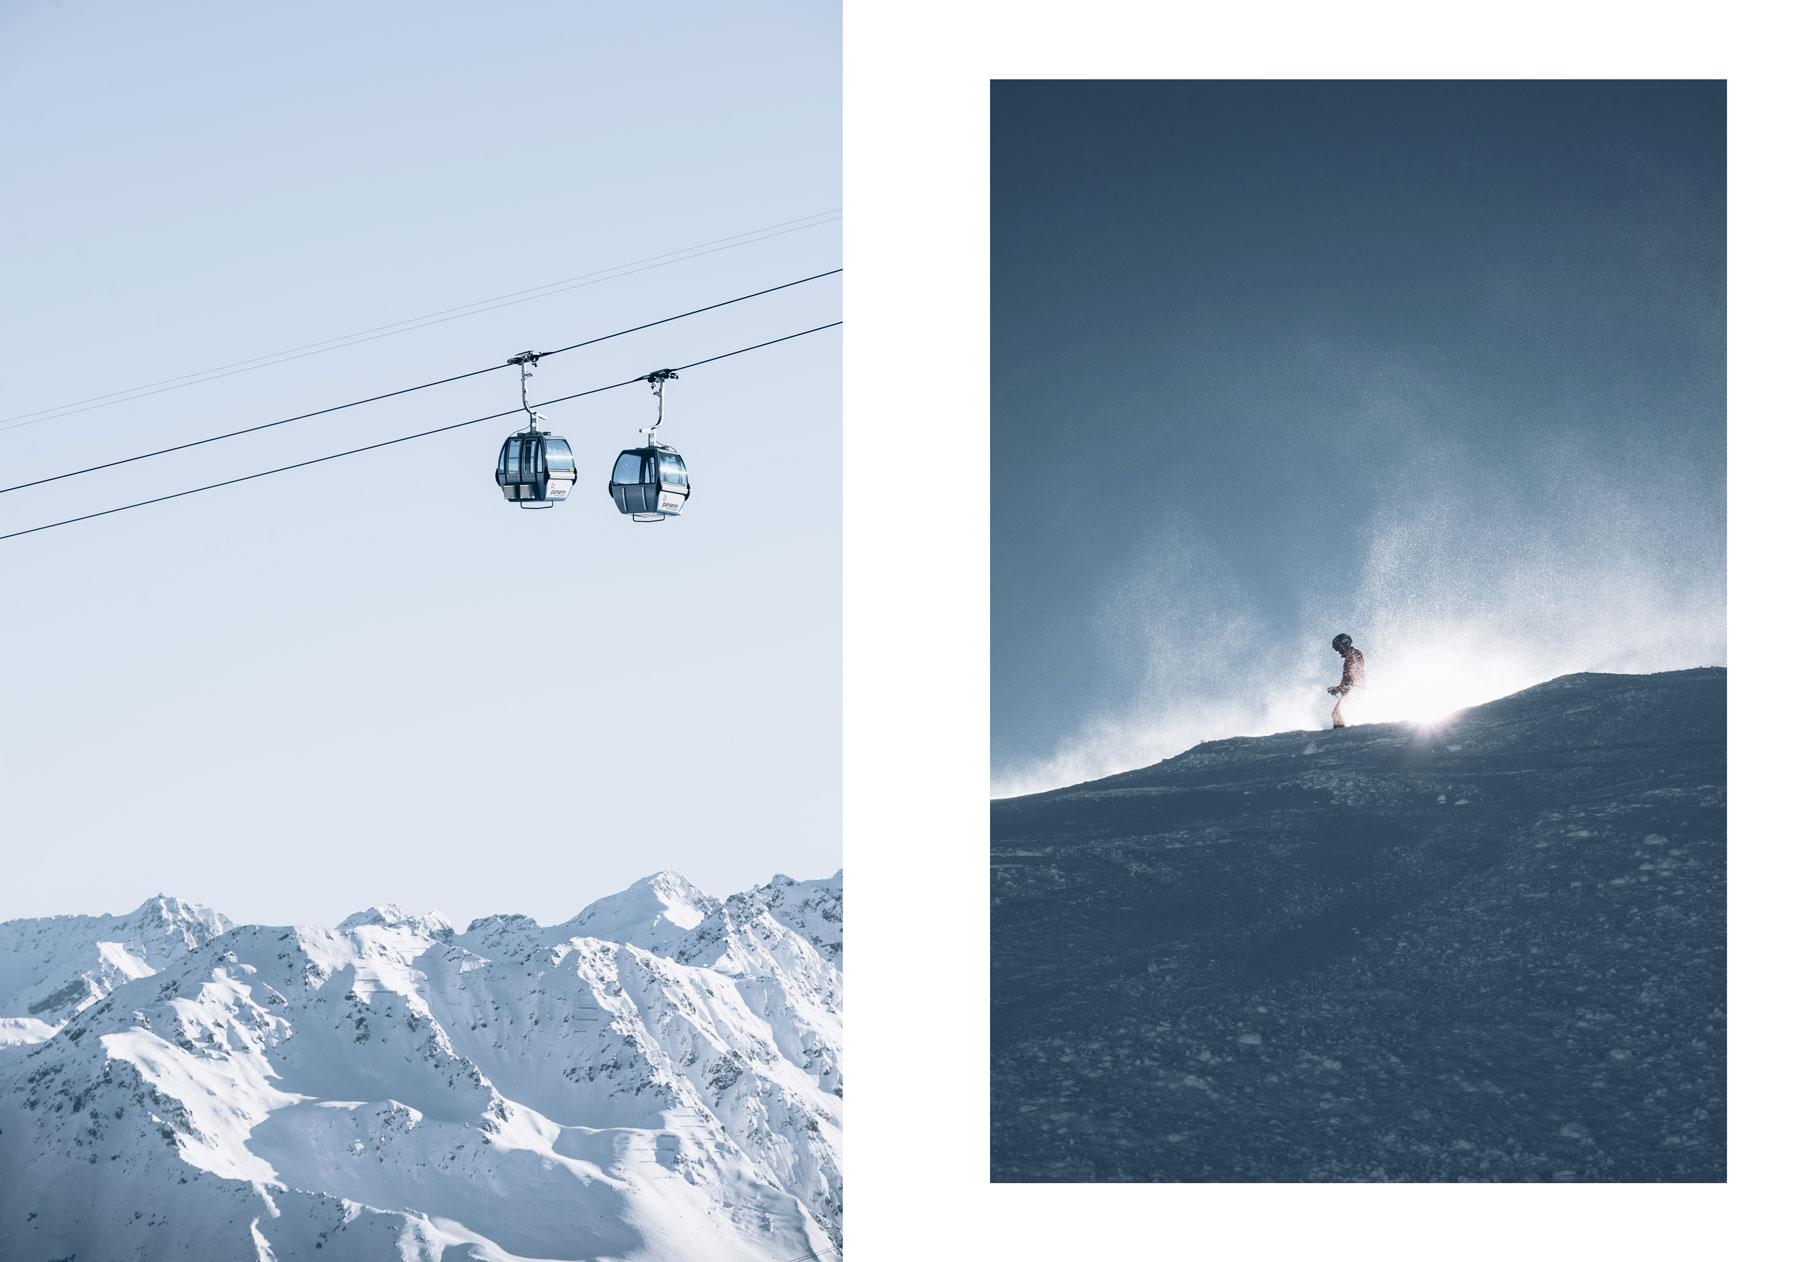 Parsenn, Davos Klosters